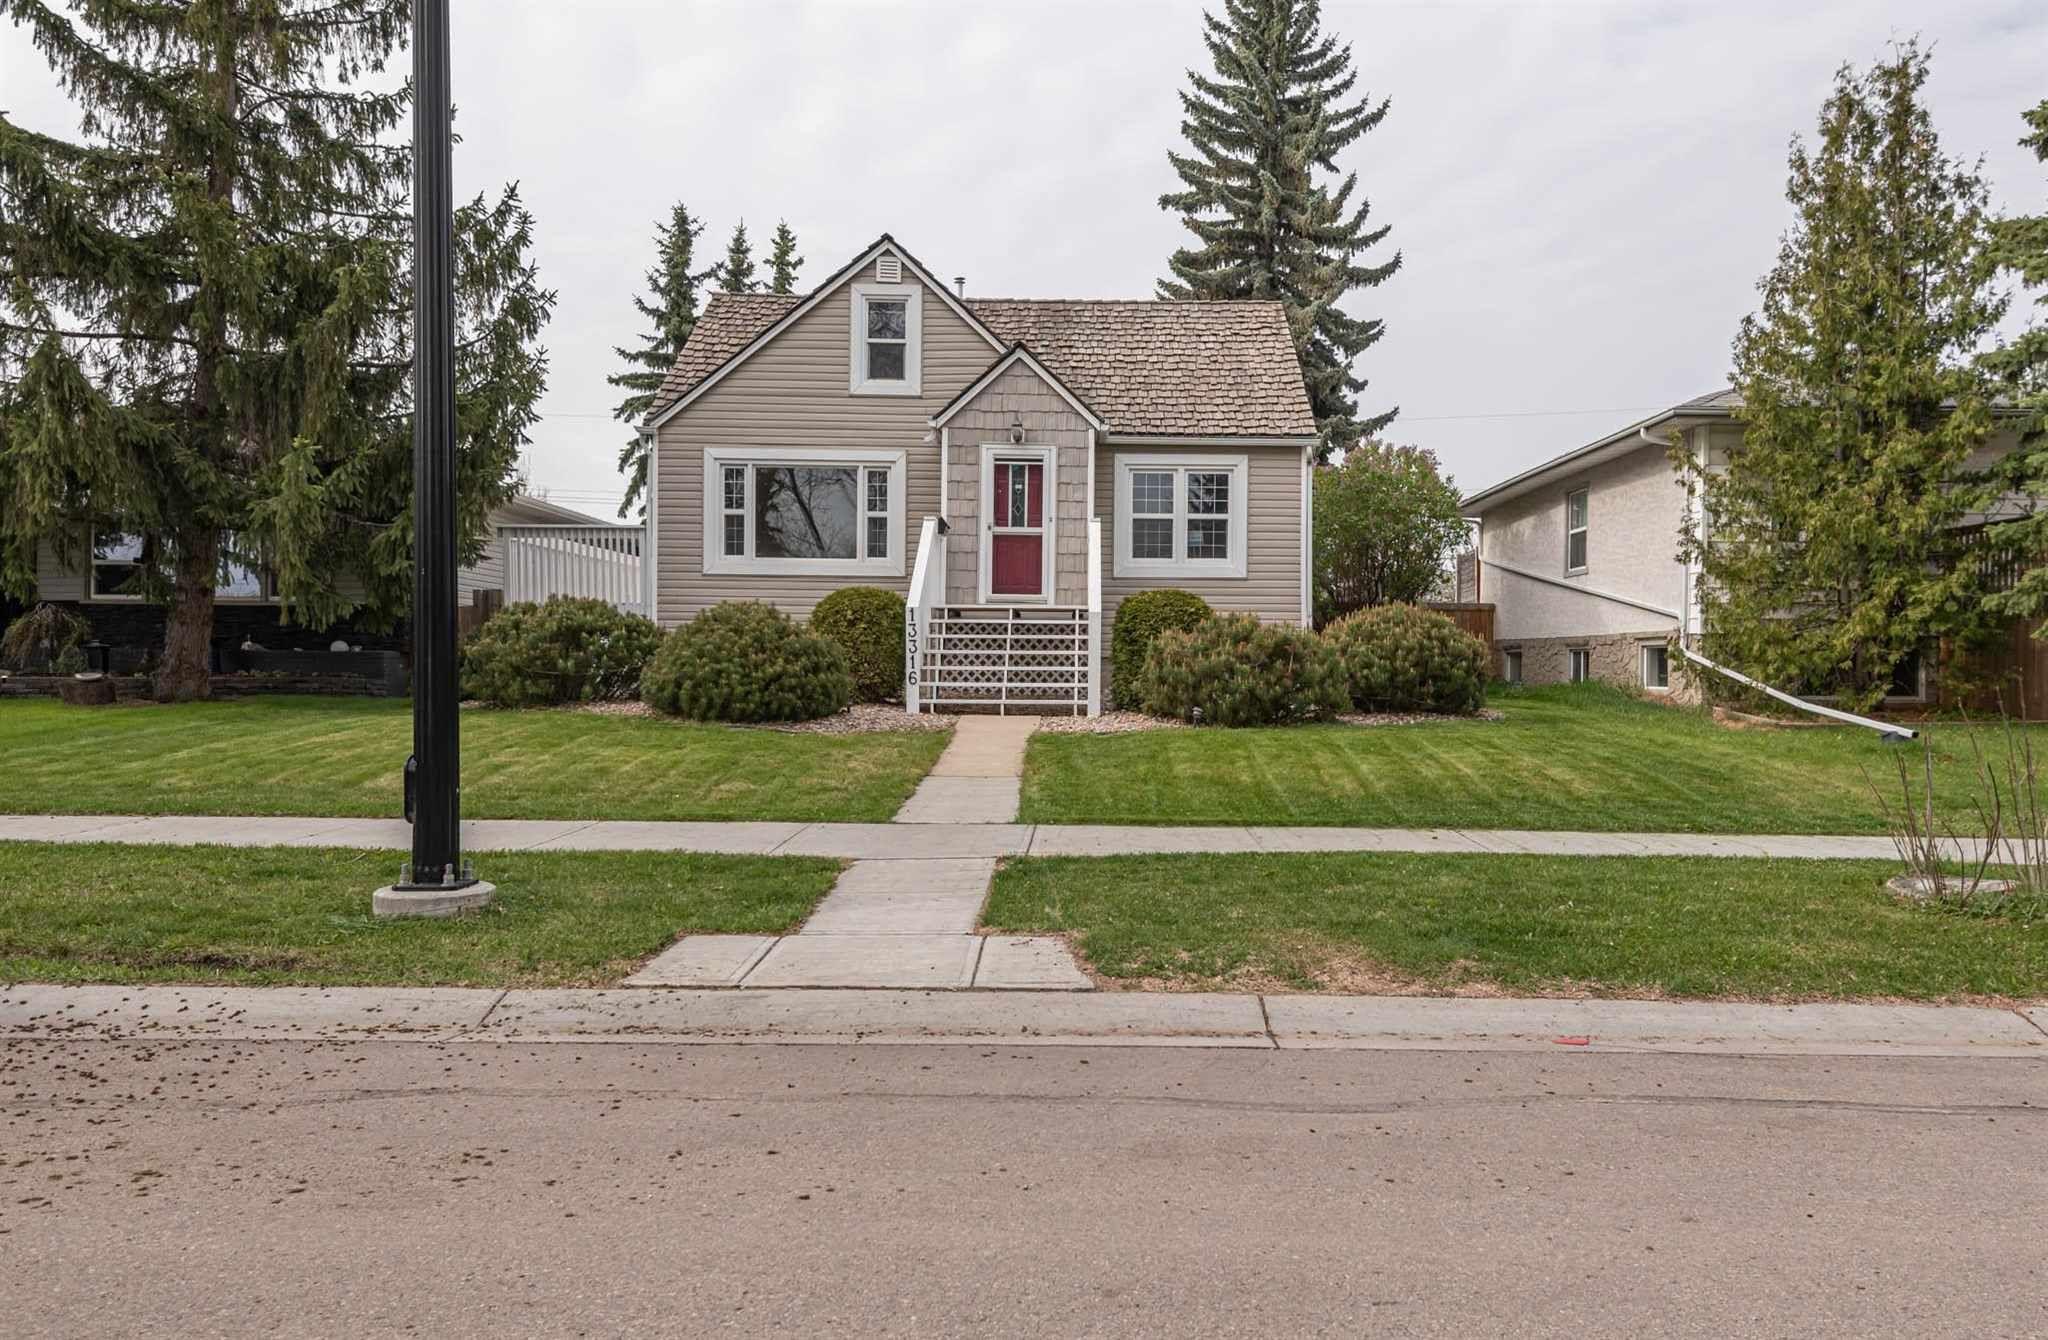 Main Photo: 13316 110A Avenue in Edmonton: Zone 07 House for sale : MLS®# E4245302